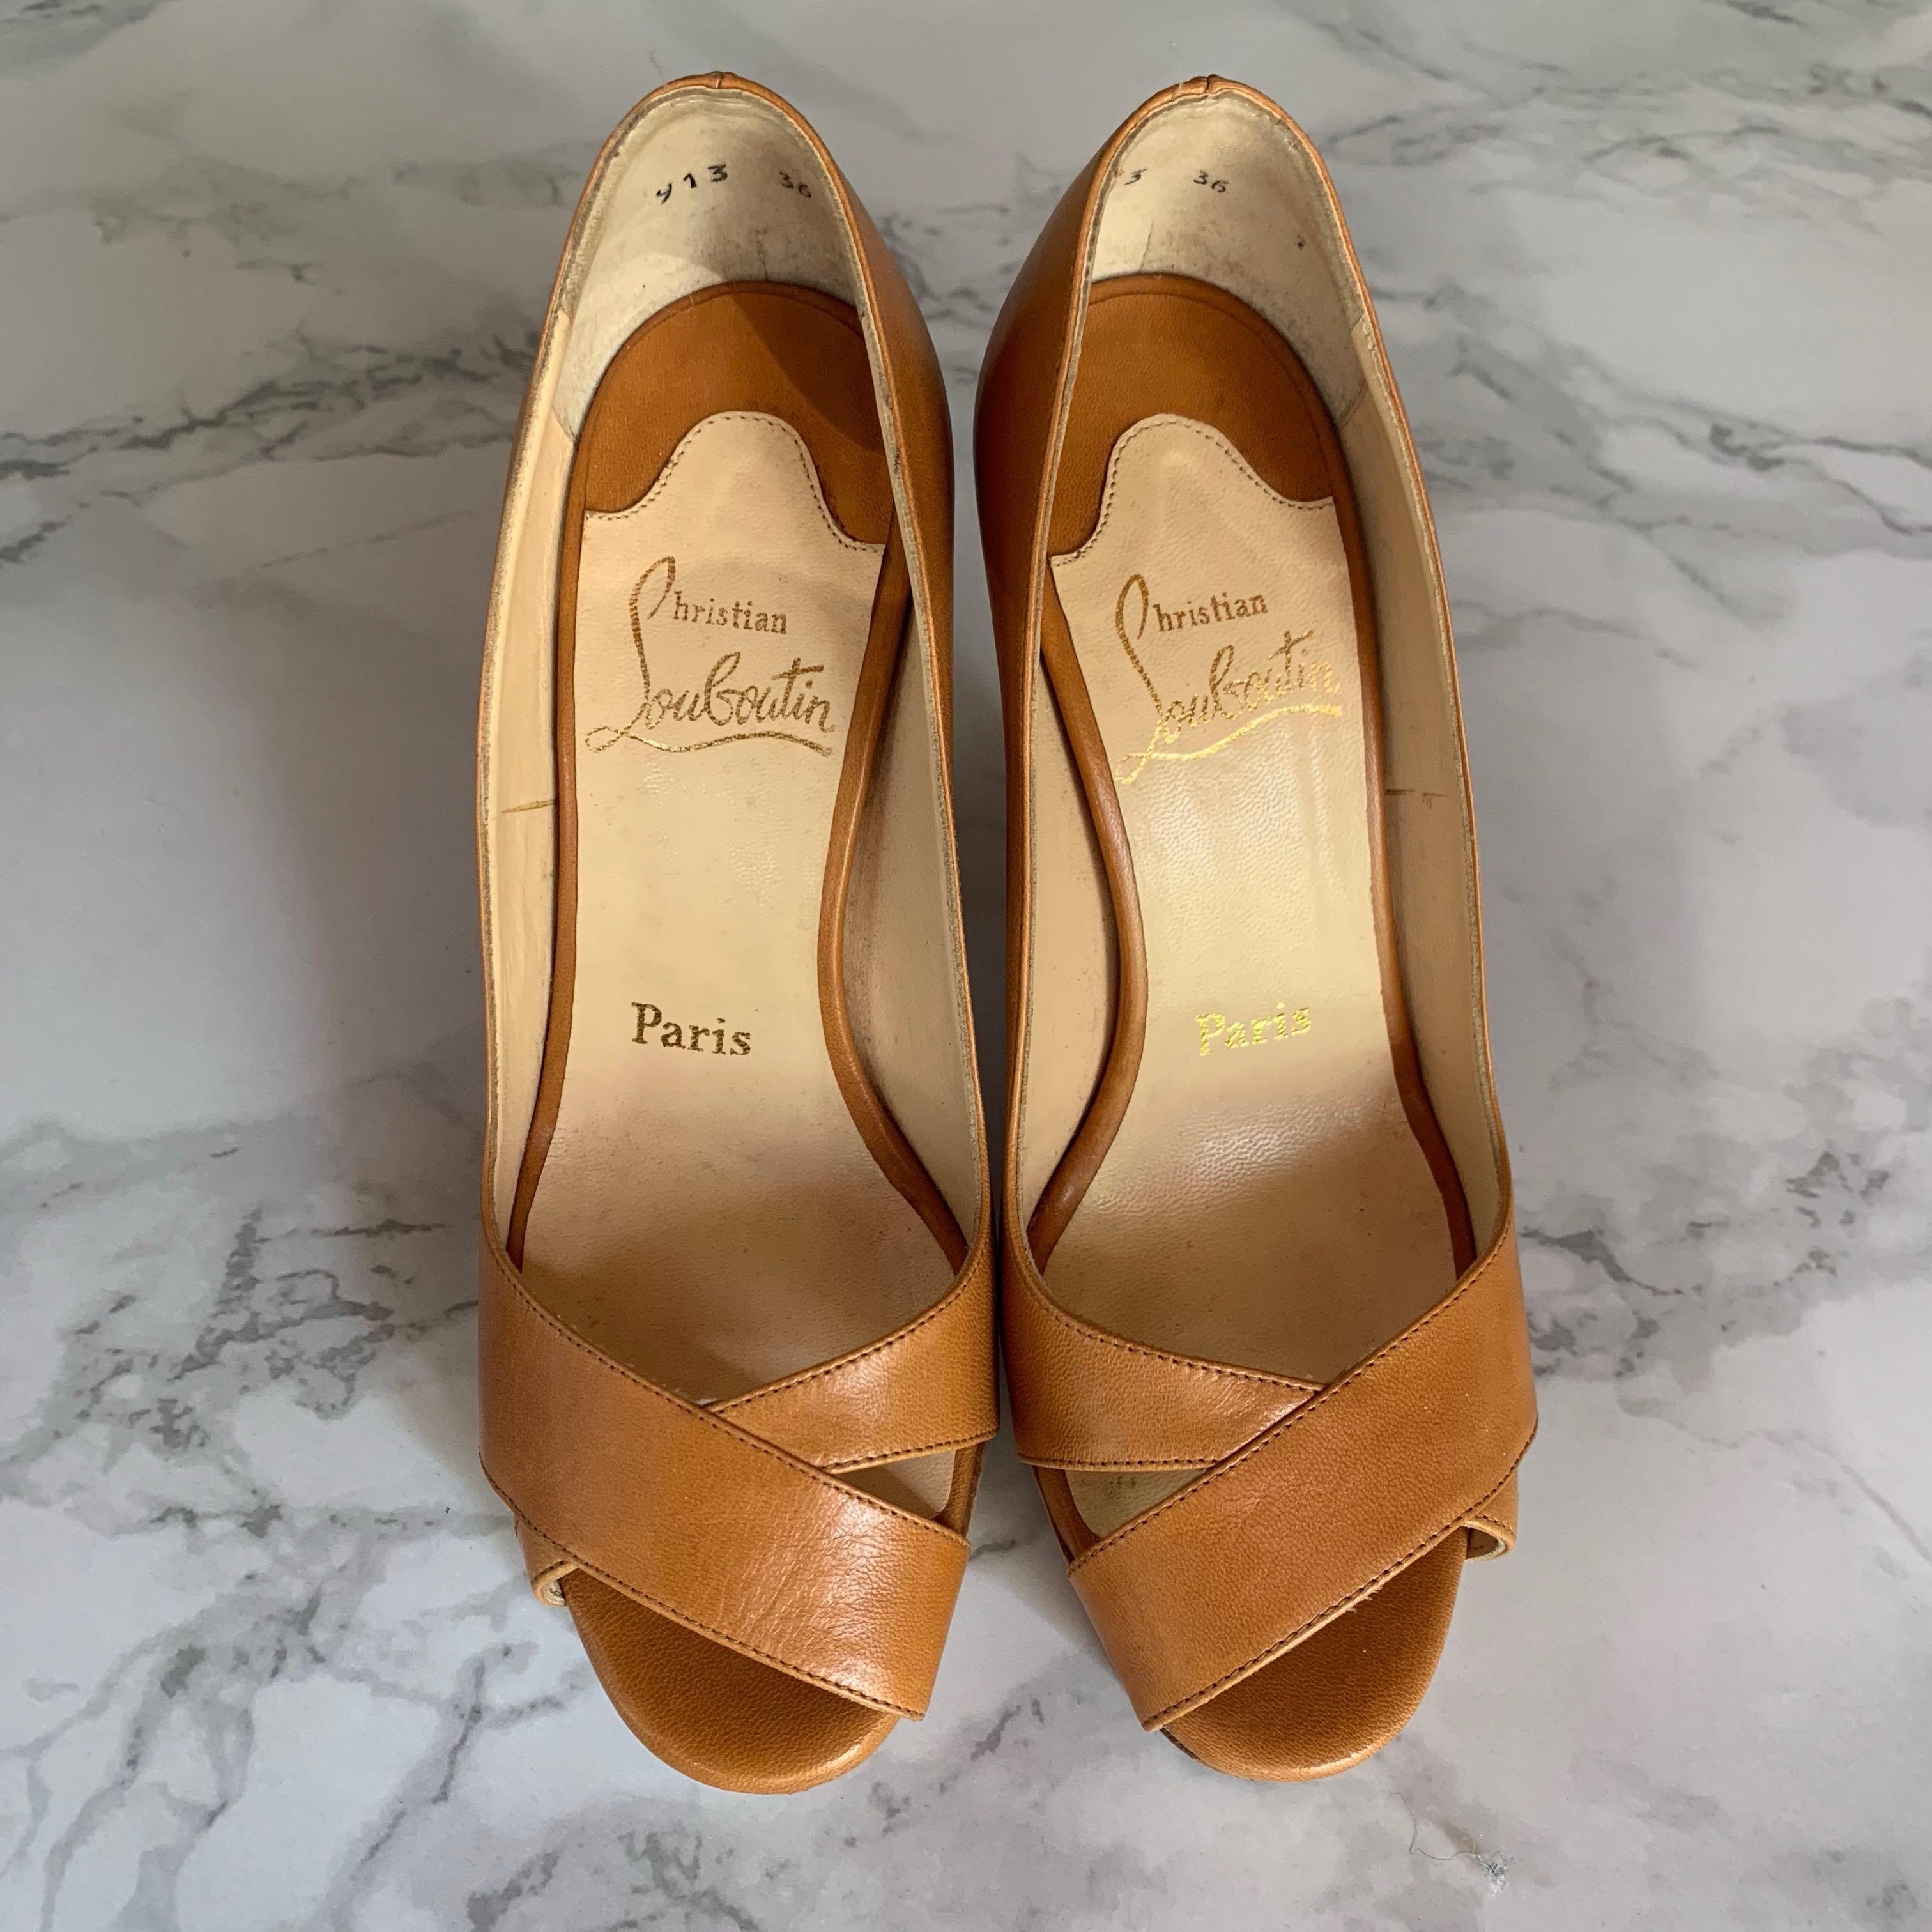 Christian Louboutin Miss Marple 120 Brown Heels size 36